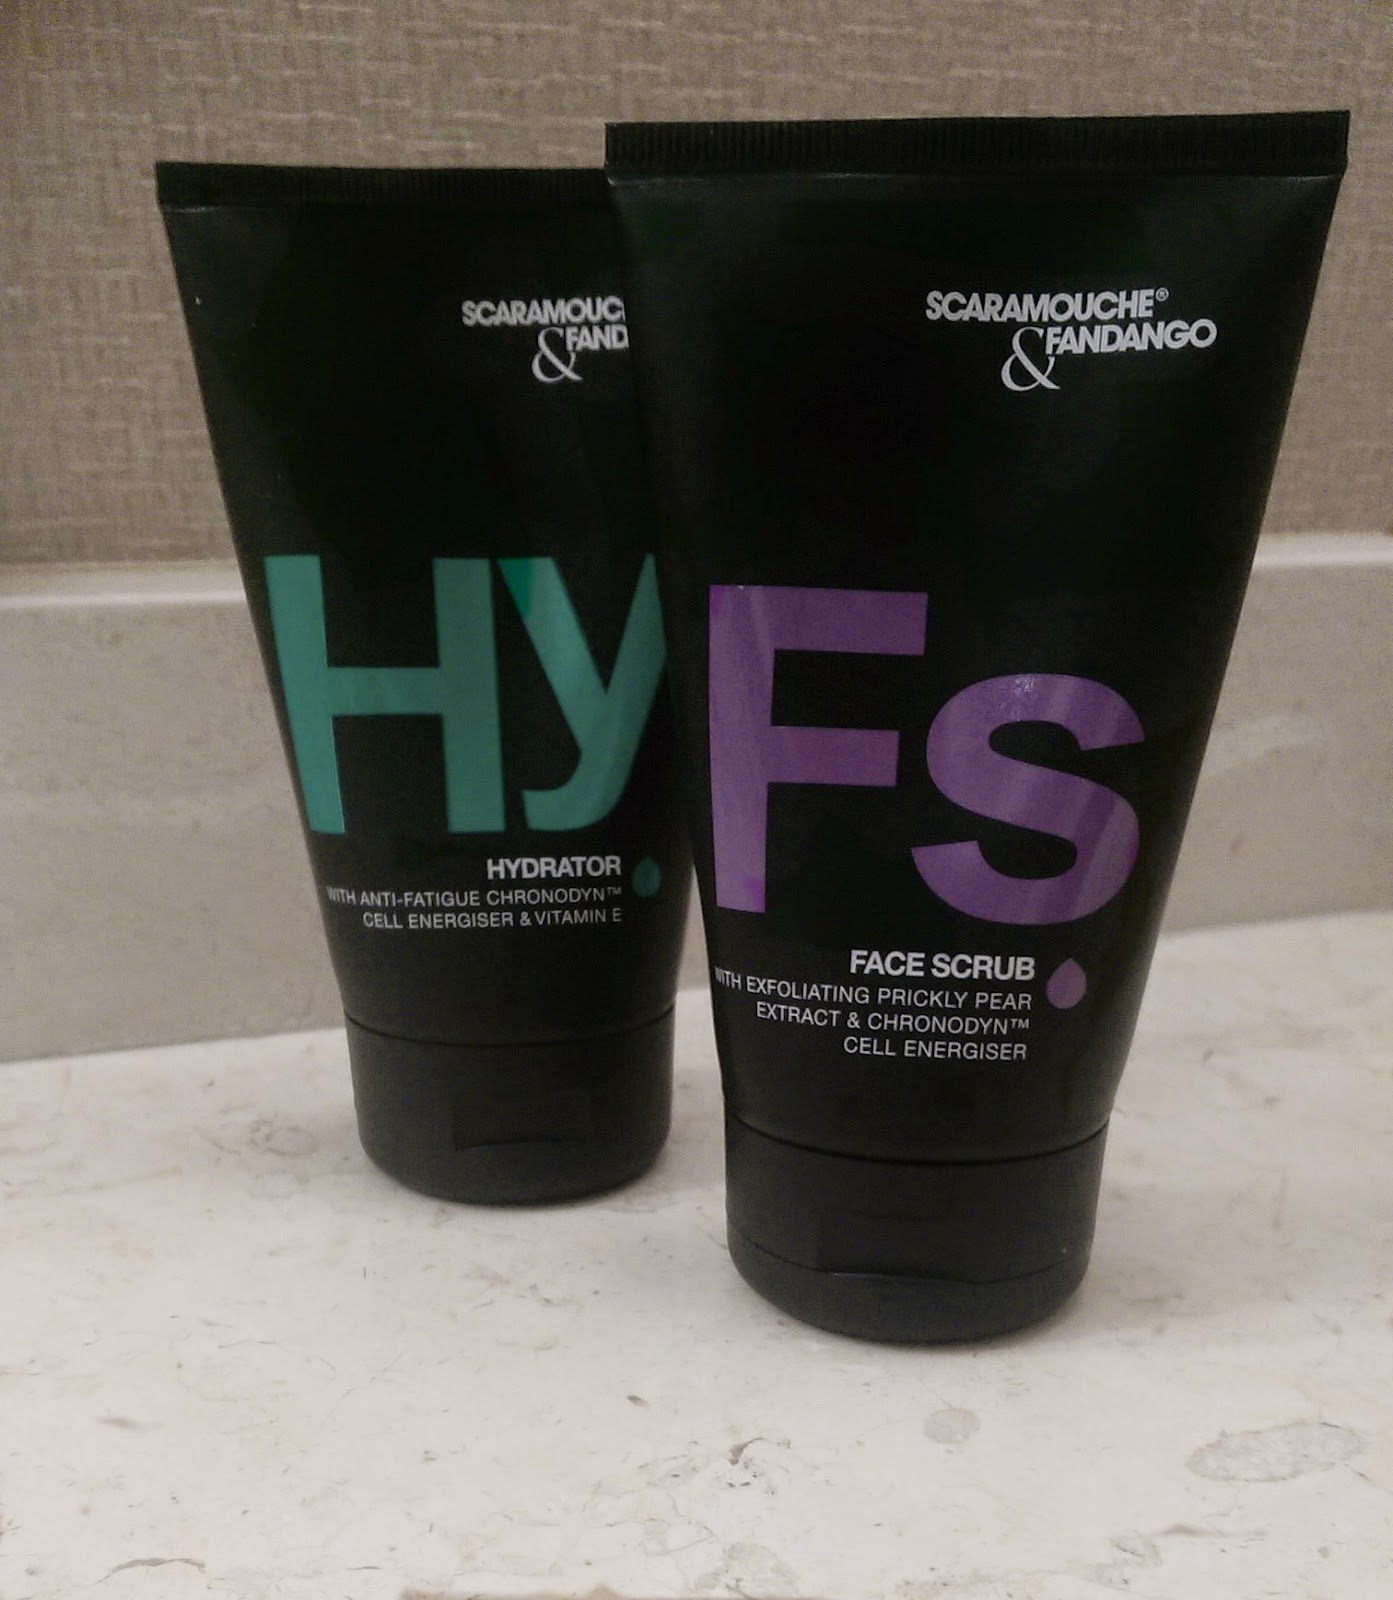 hydrator face scrub grooming rogues brogues scaramouche fandango blog